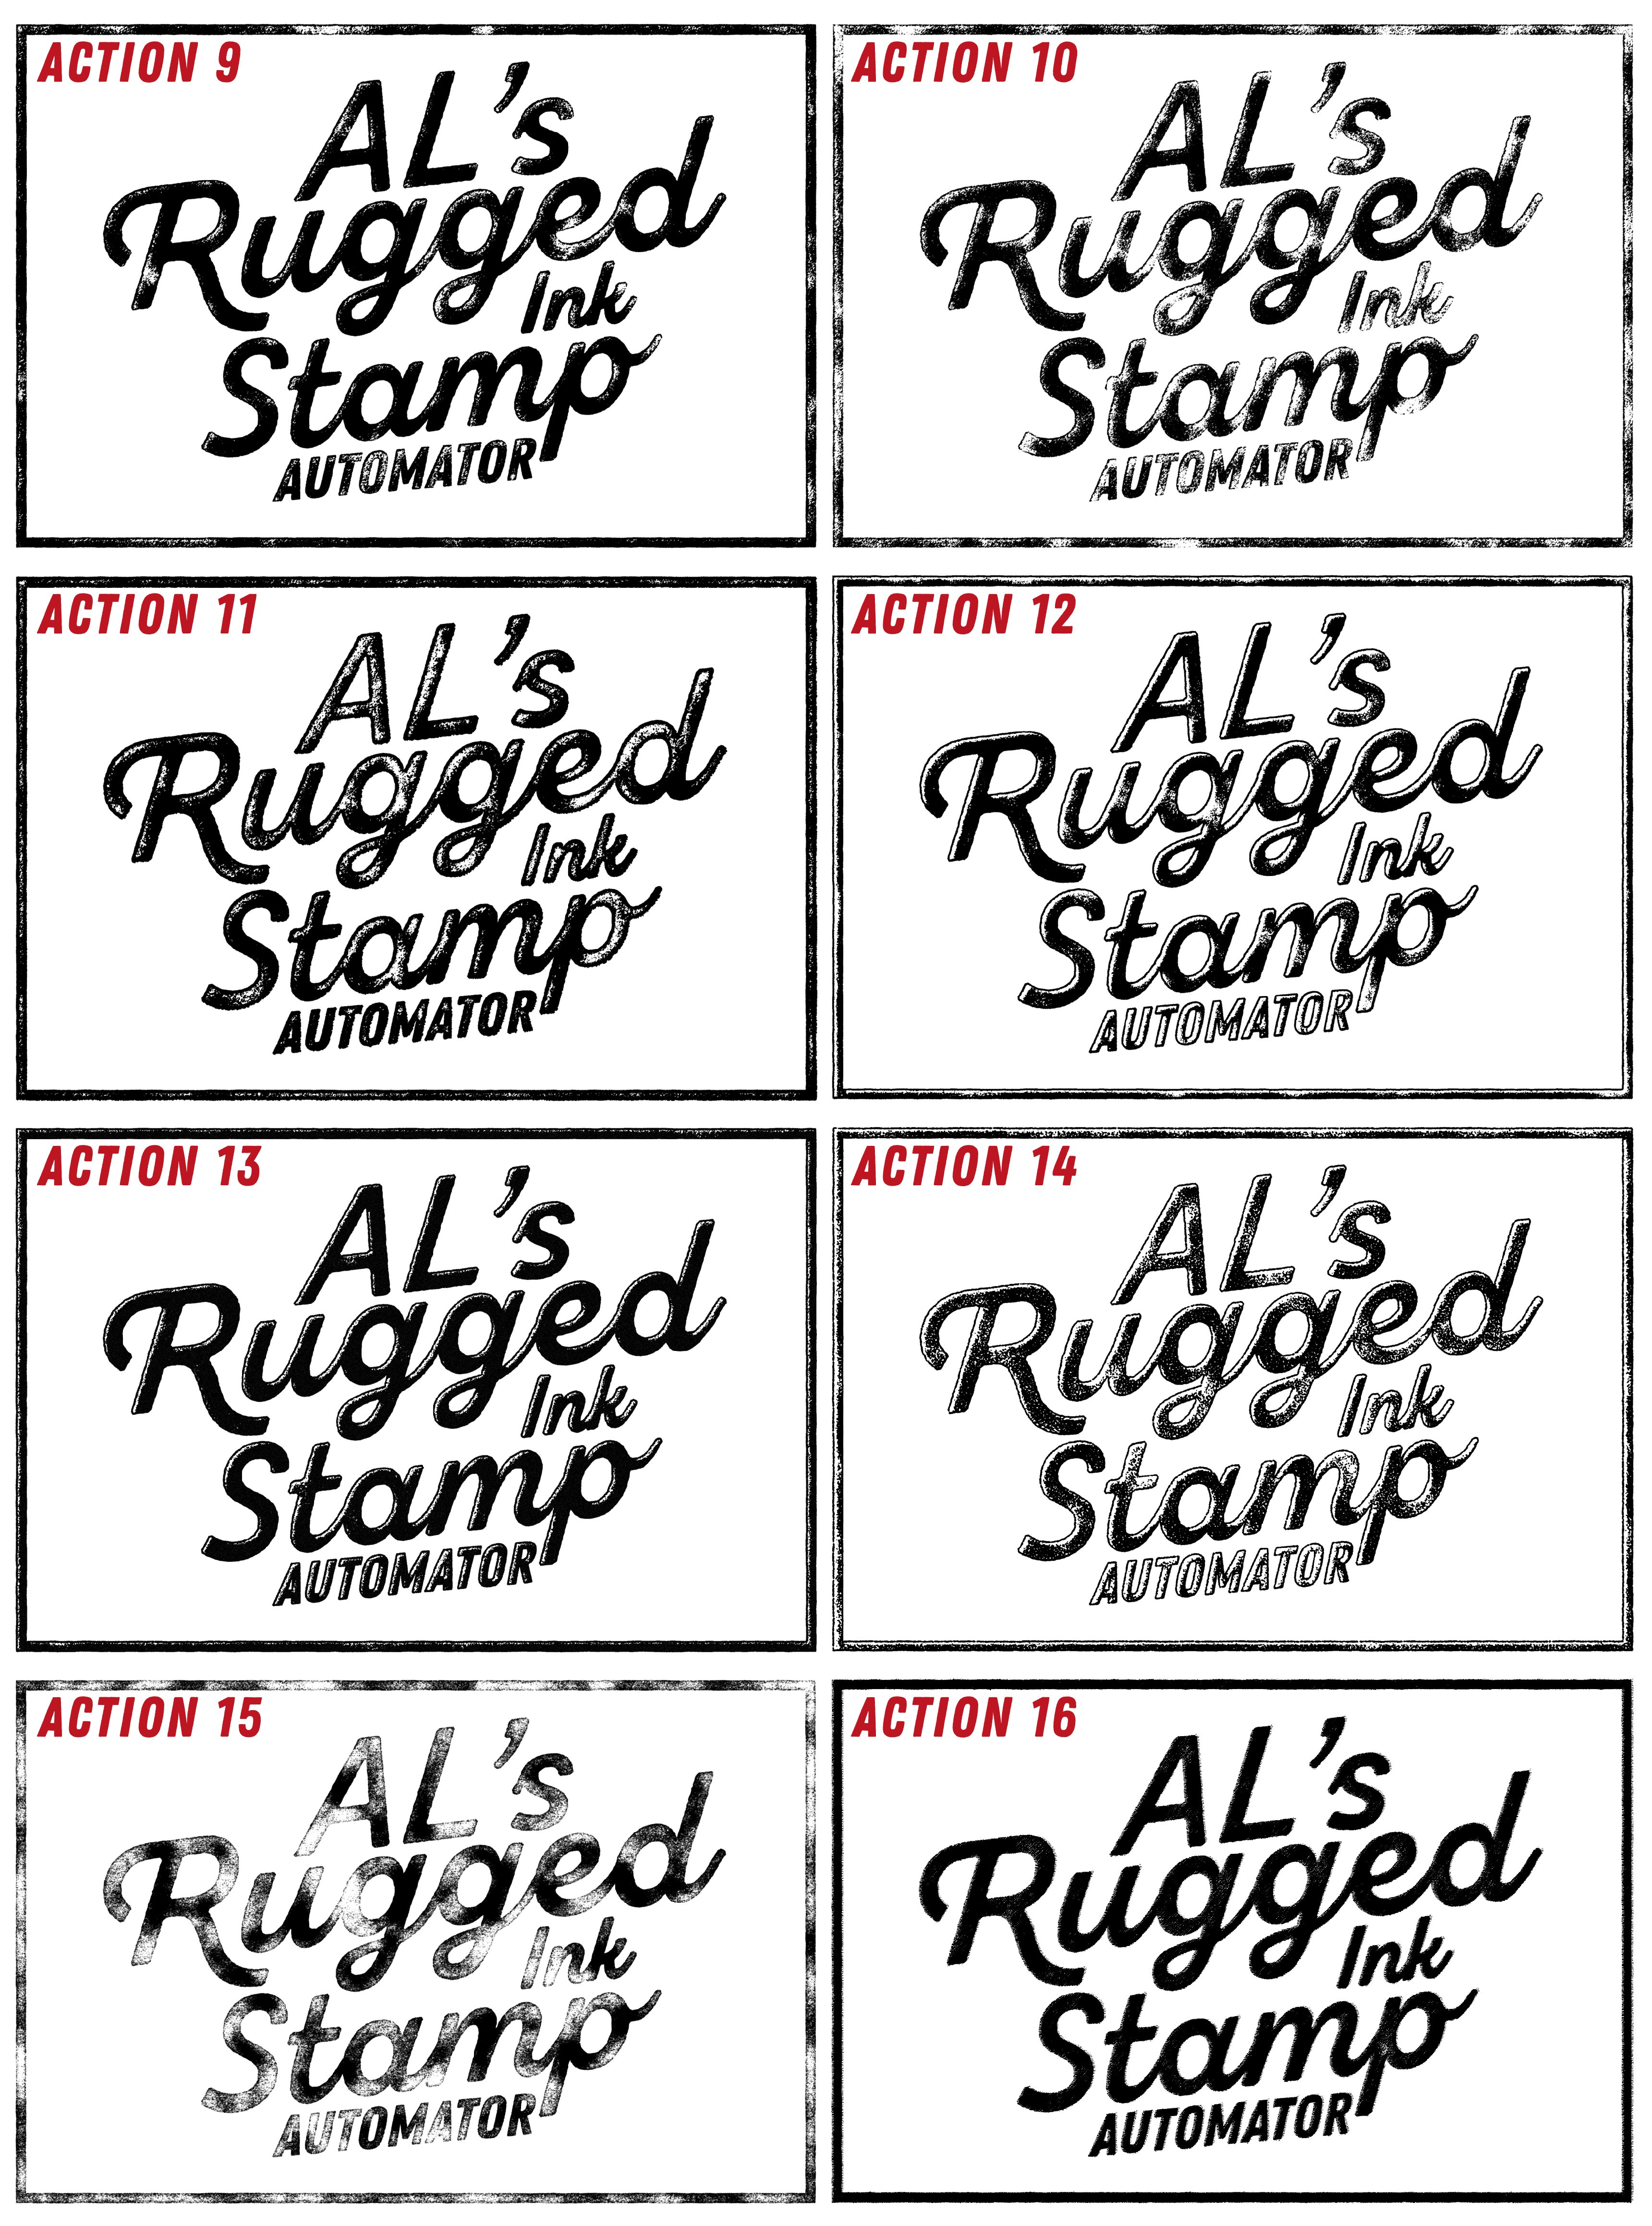 [Image: als-rugged-ink-stamp-automator-07-.jpg?1...59c4bc4b8d]